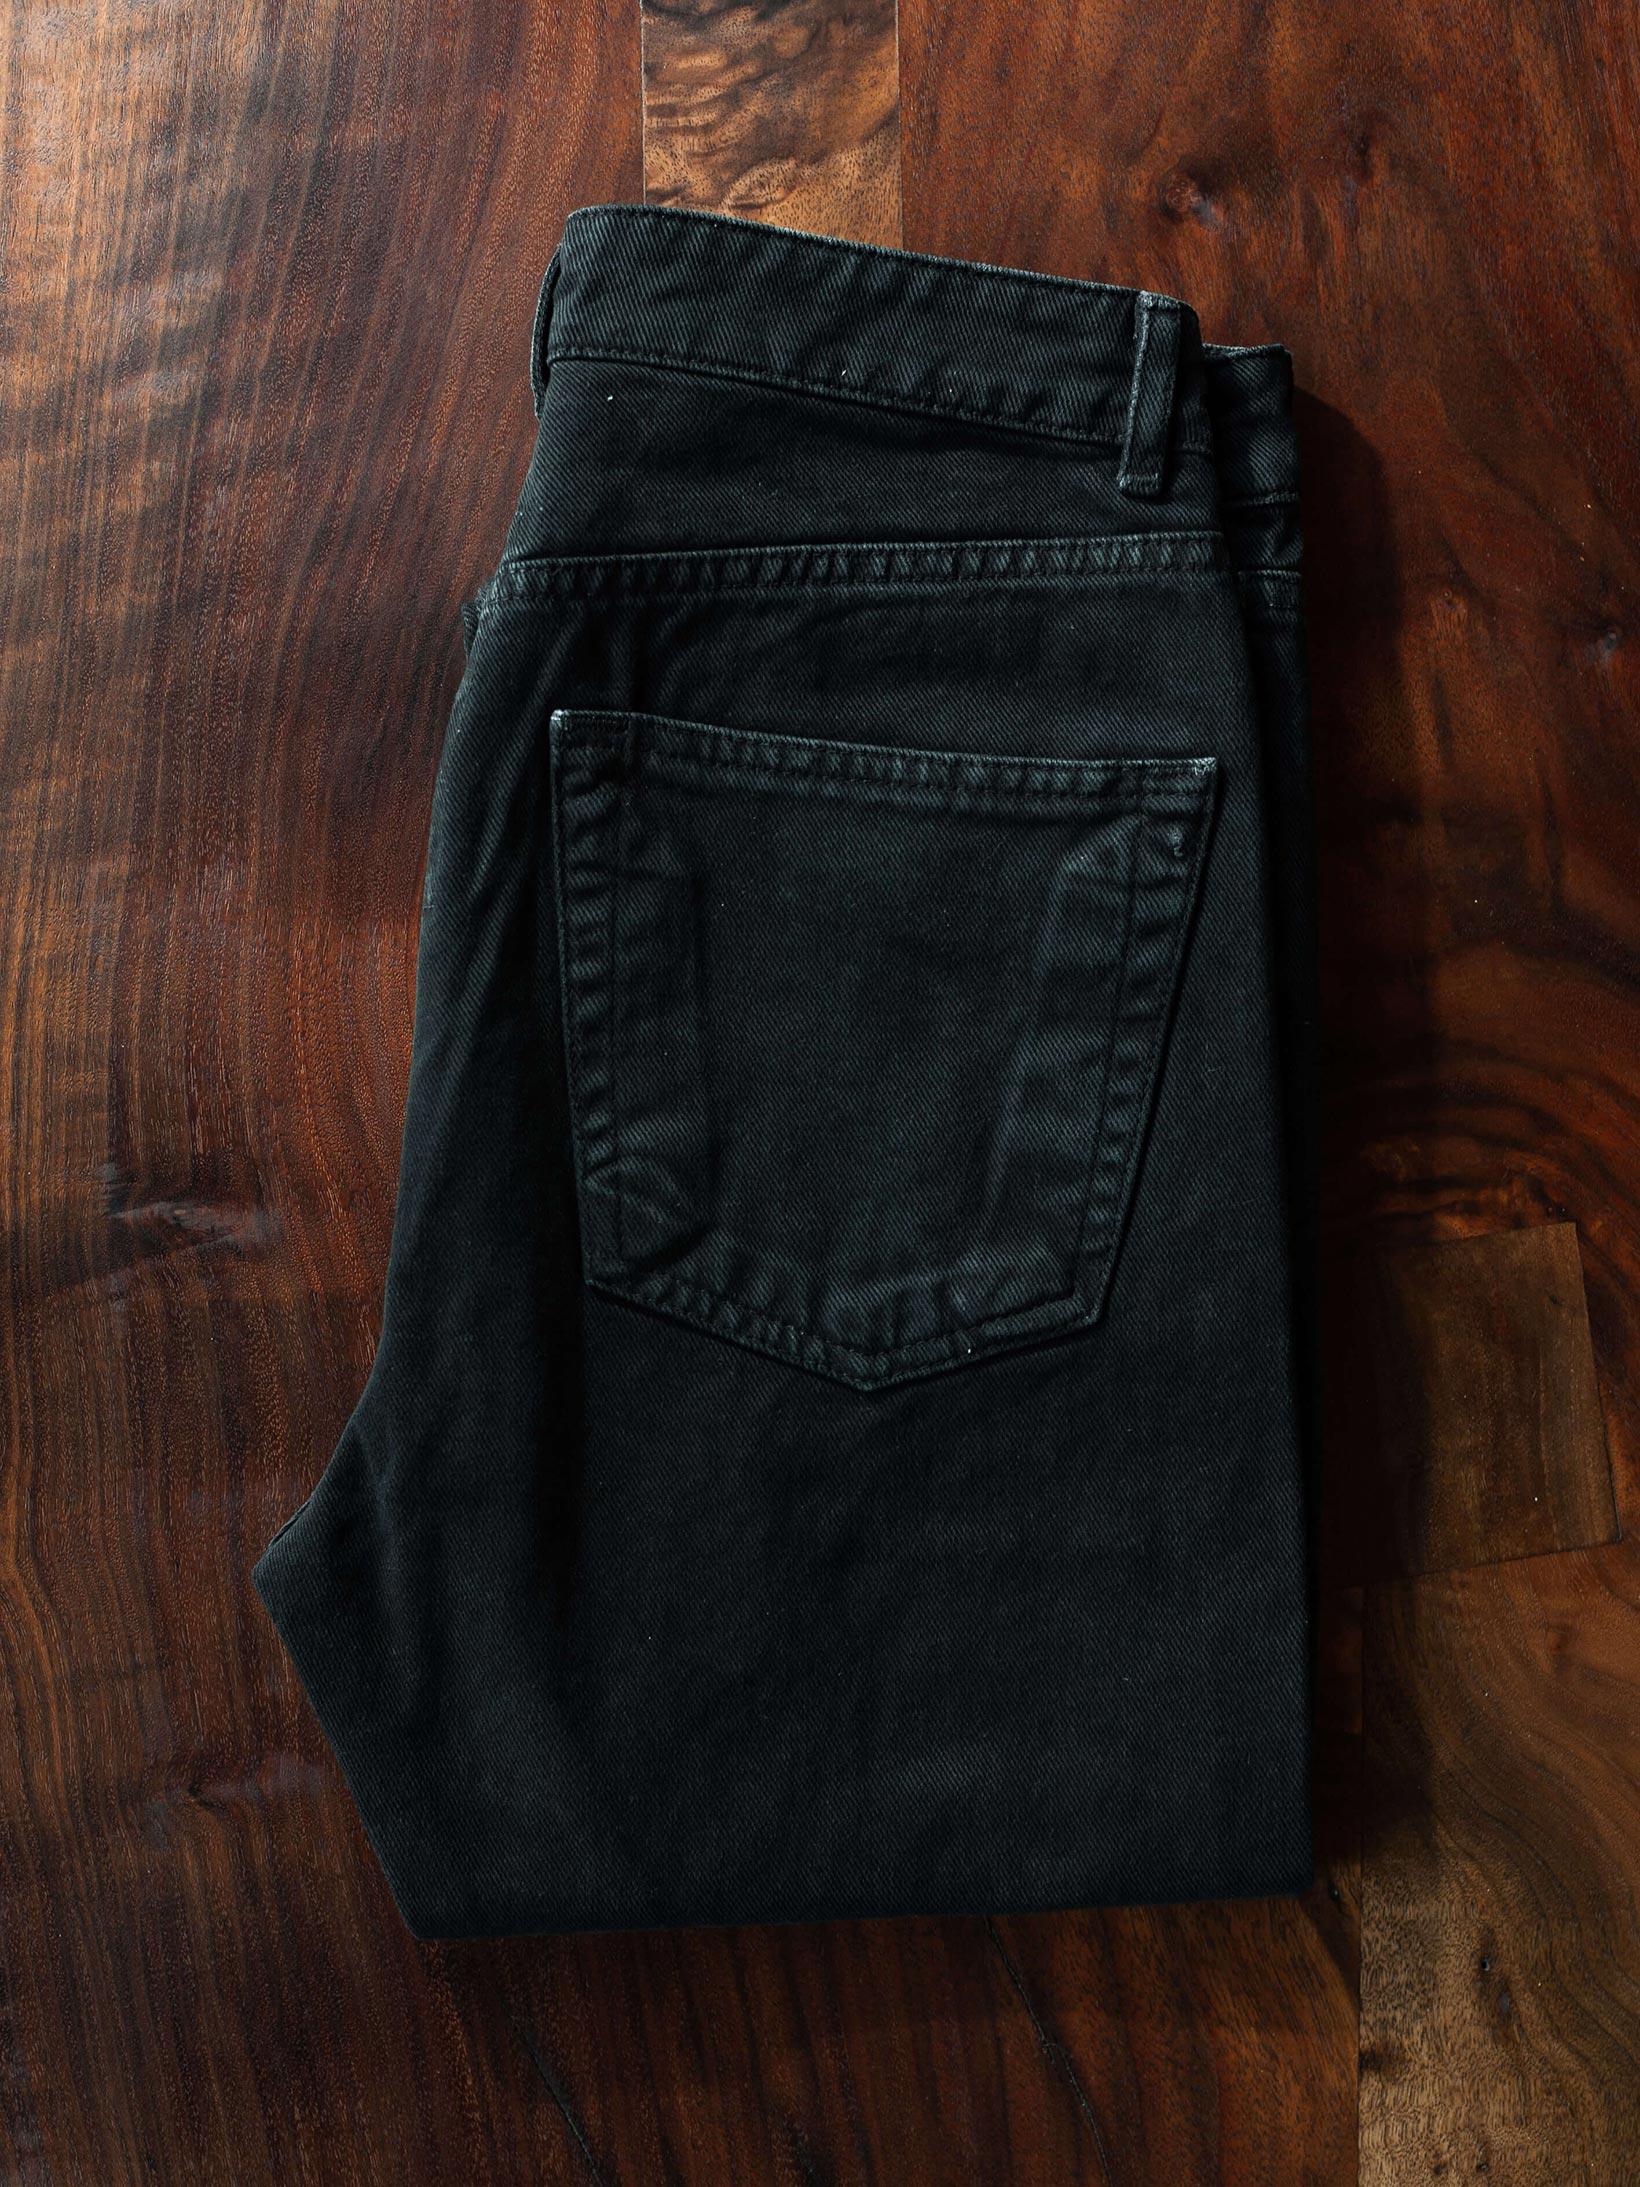 Rick Owens DRKSHDW Torrance Jeans - Garment Dyed Black - Image 17